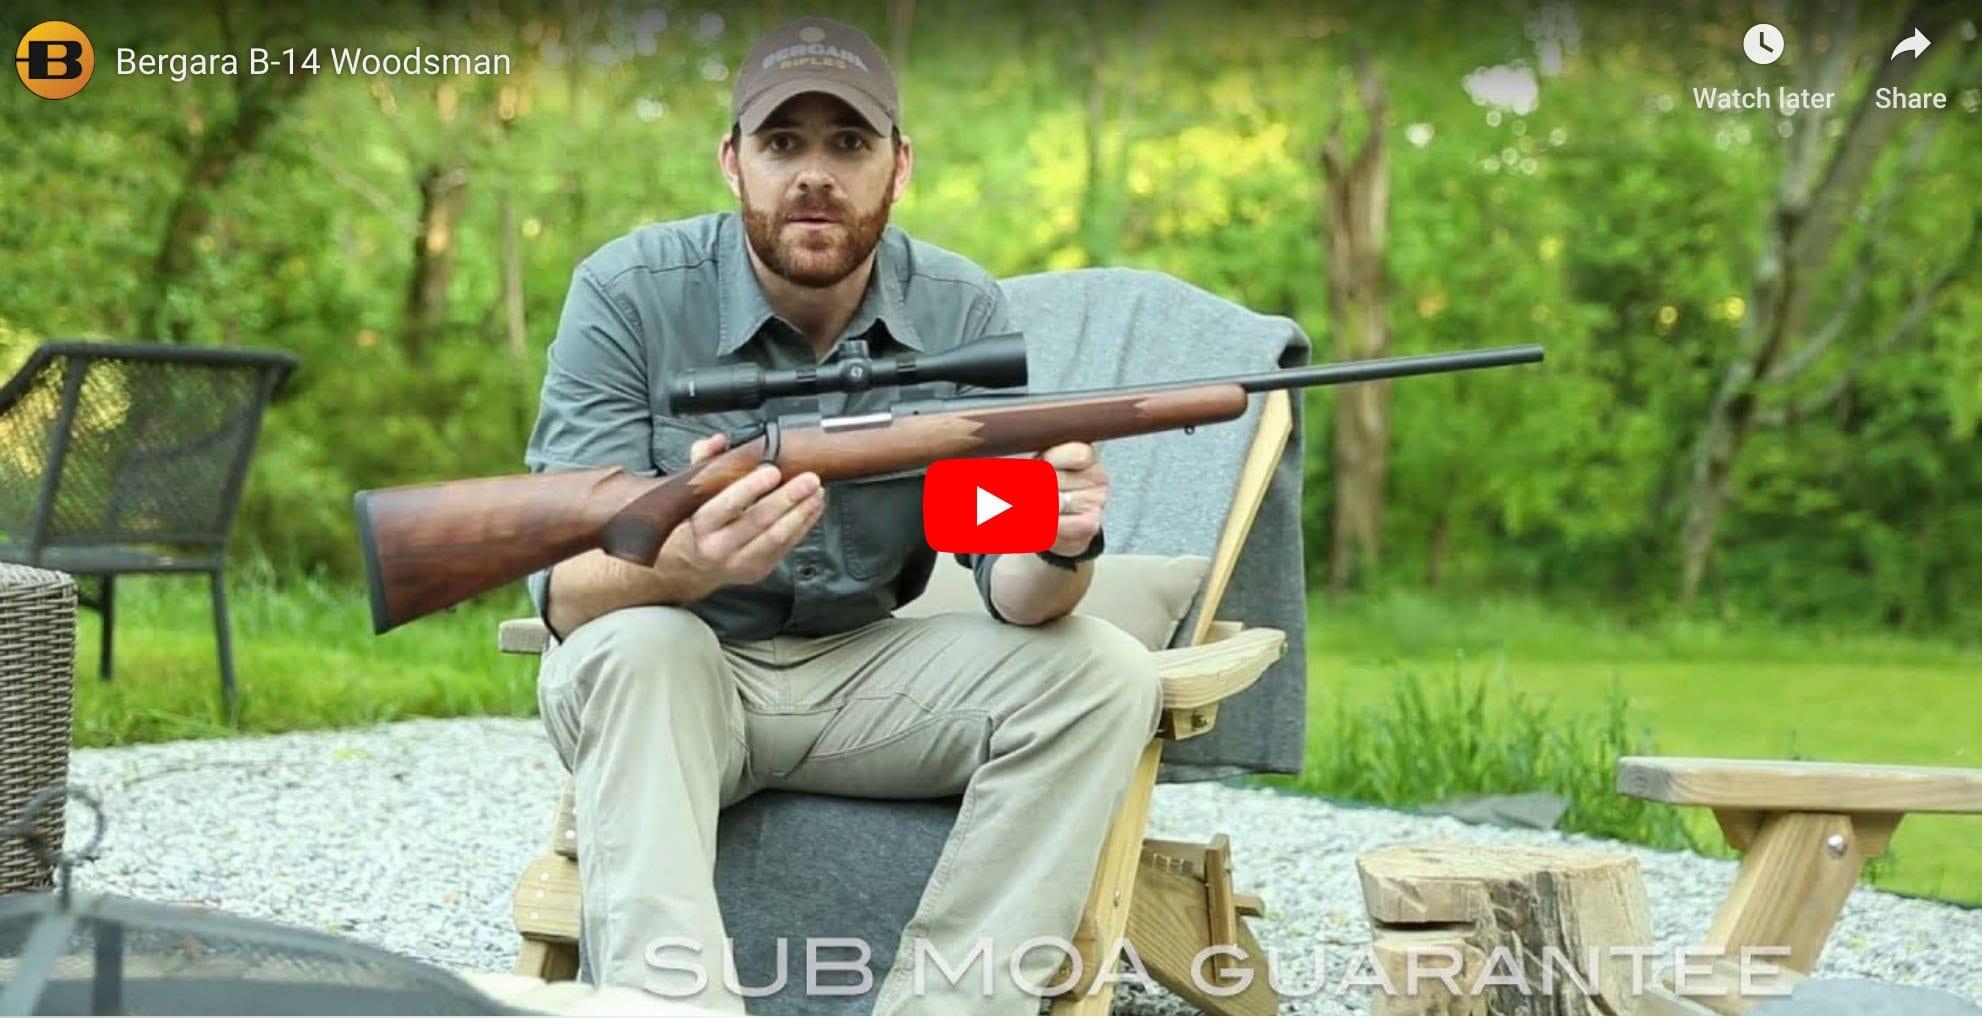 Woodsman Video